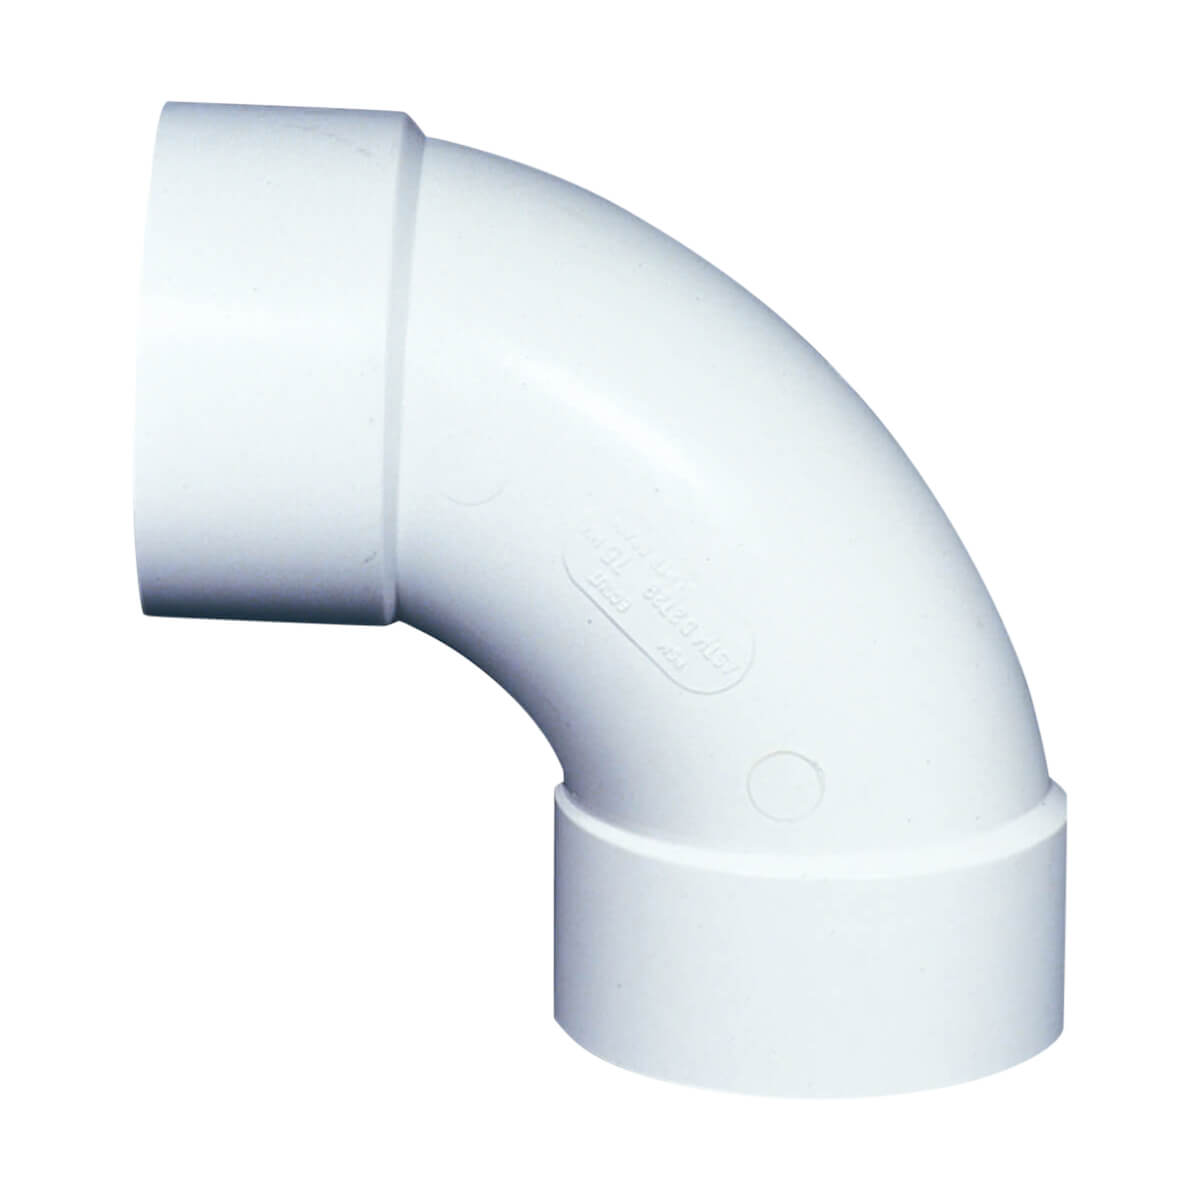 PVC-BDS 90° Elbow - Hub - 3-in